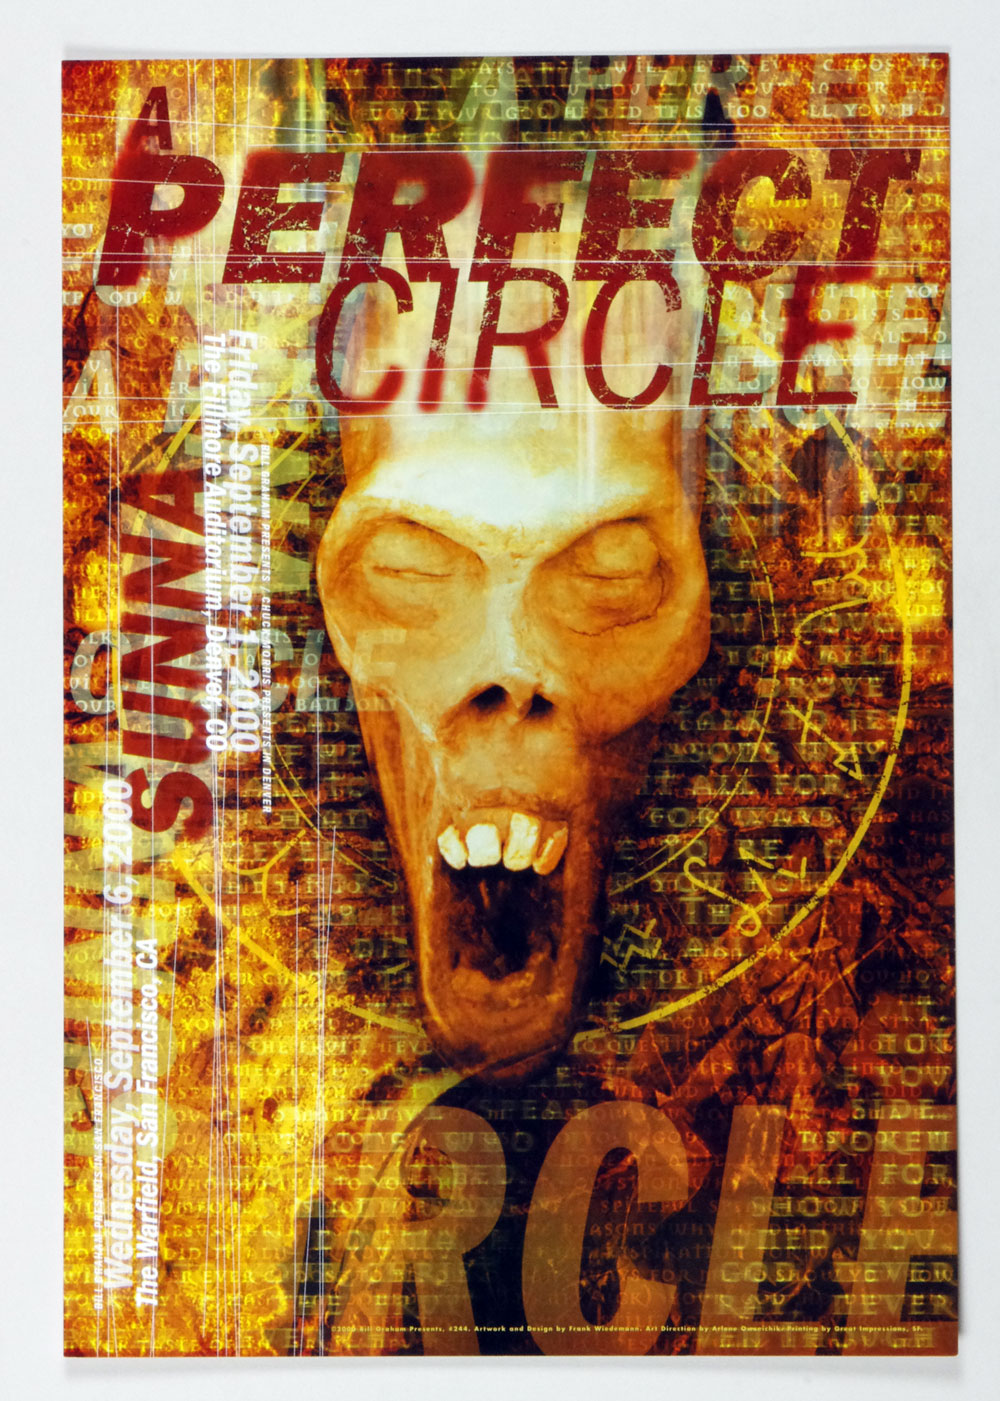 A Perfect Circle Poster 2000 Sep 6 The Warfiled Theatre San Francisco BGP 244